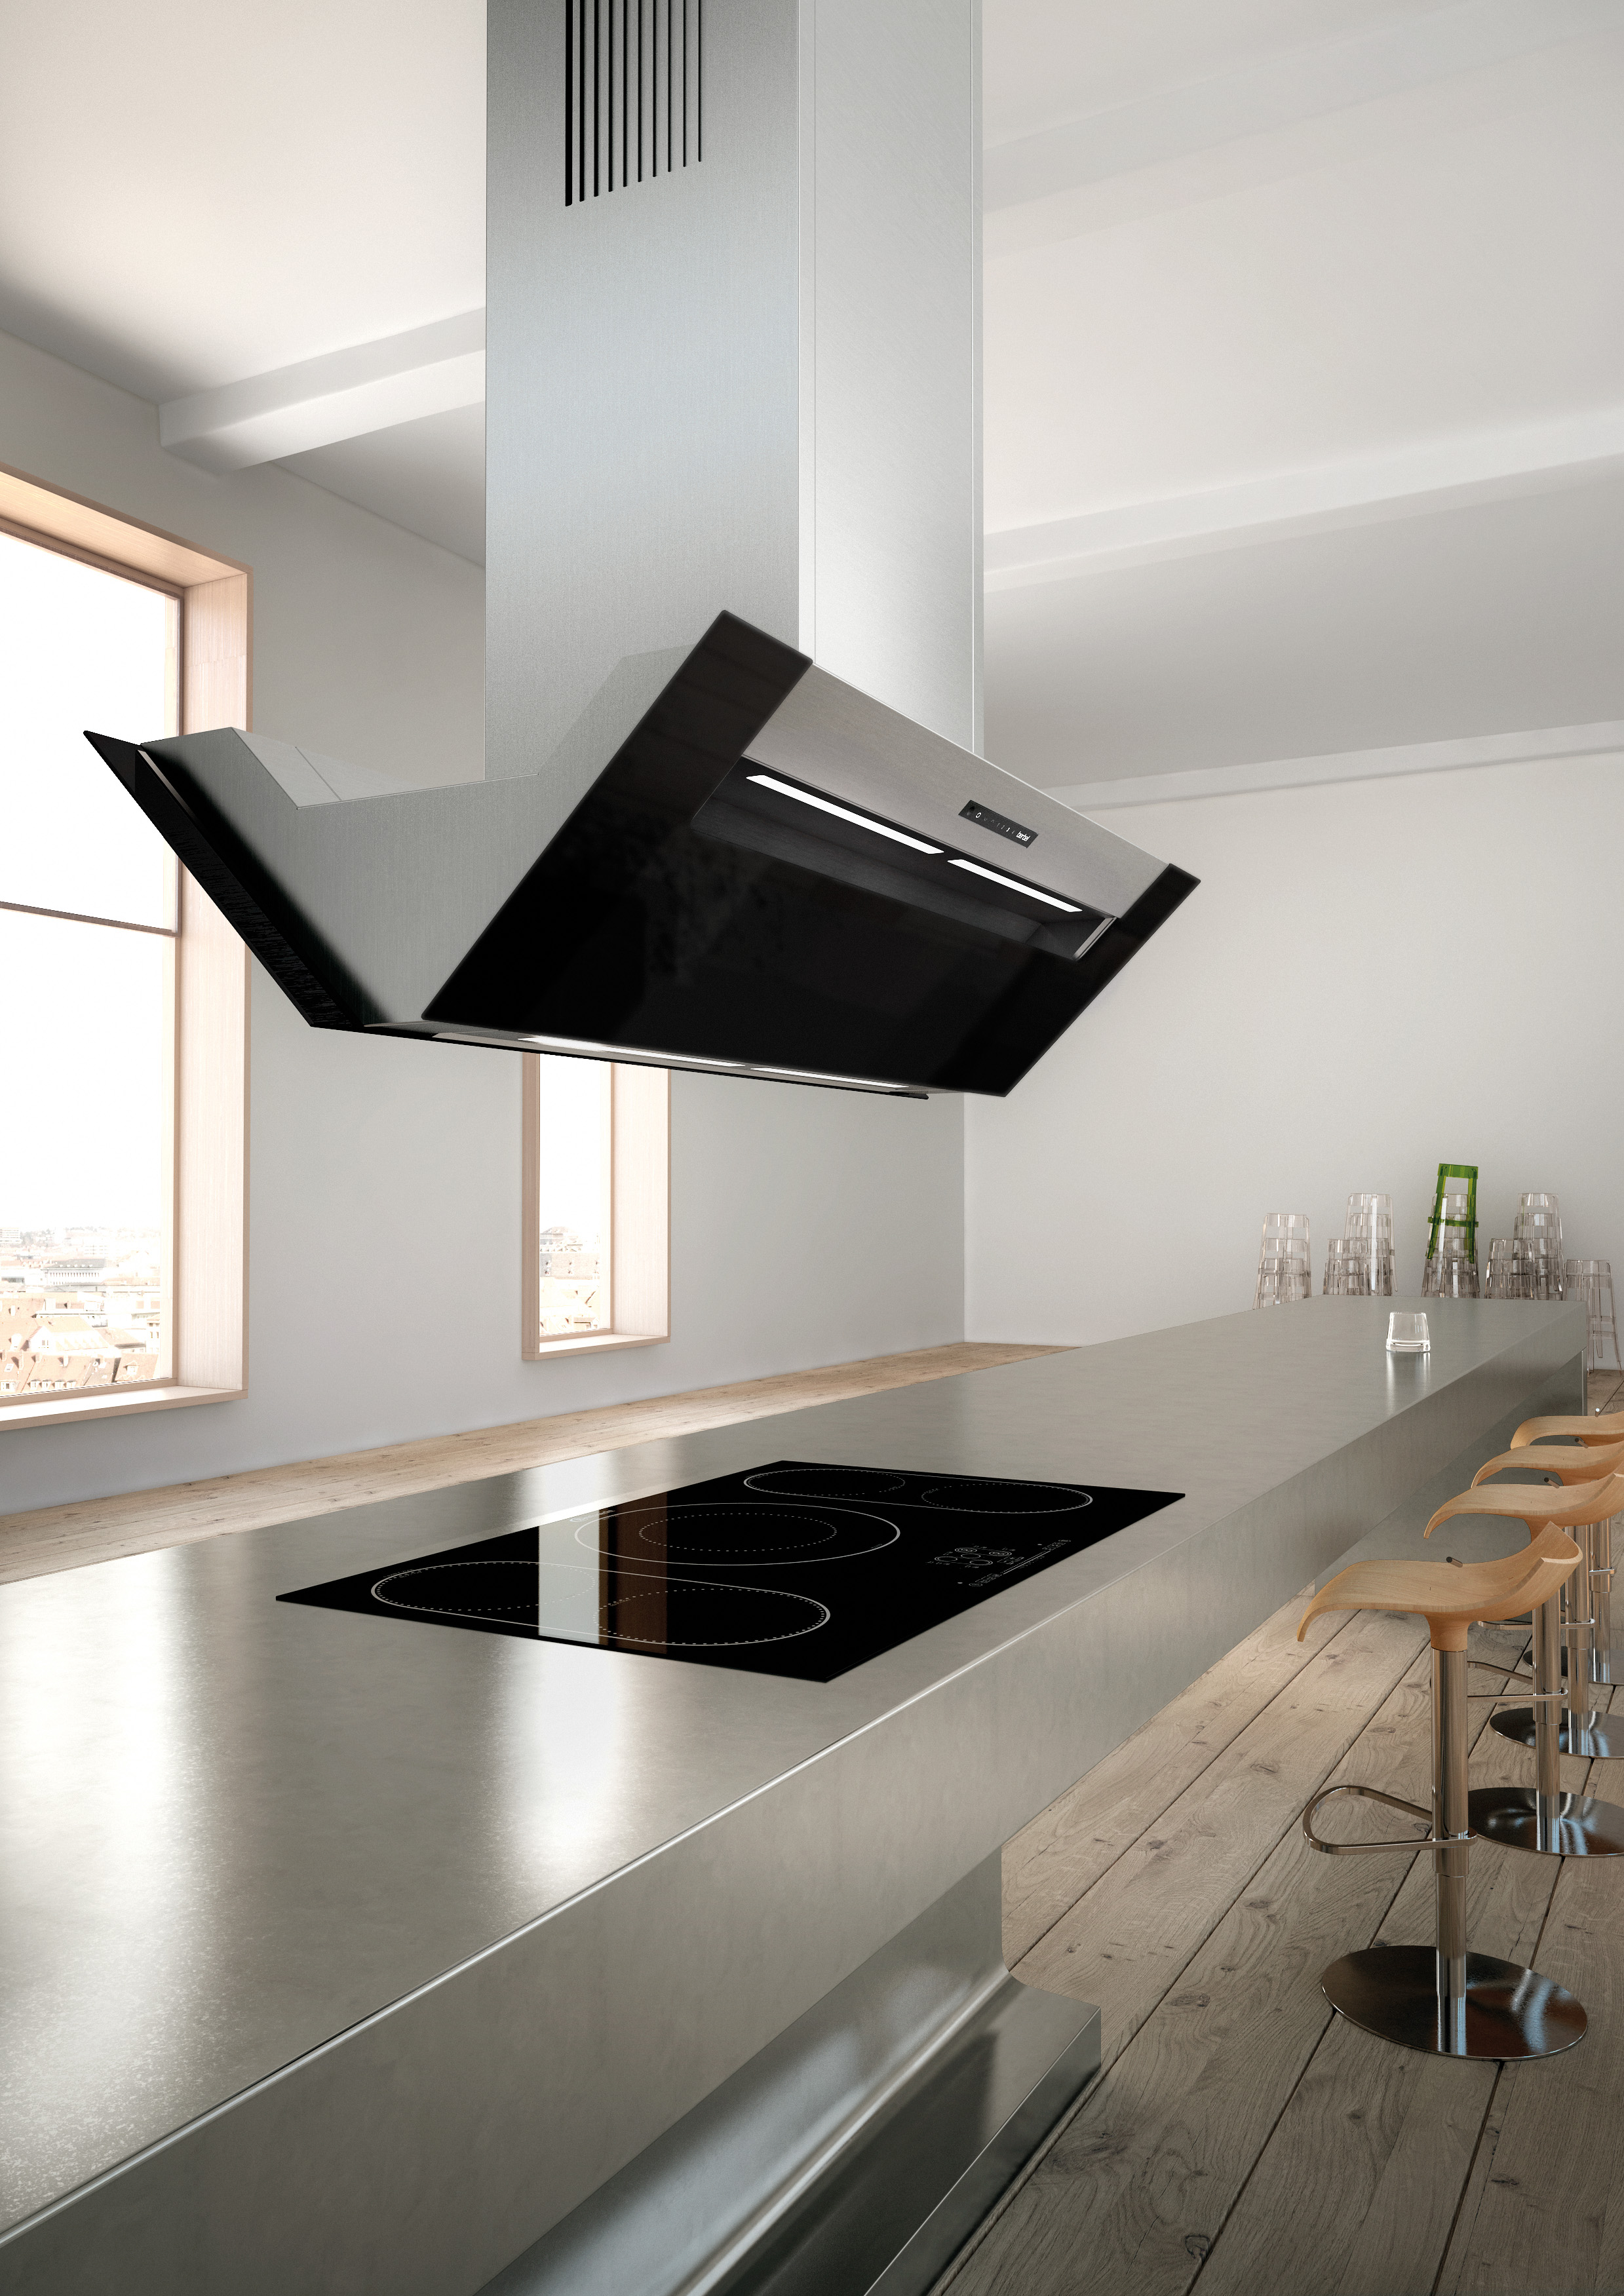 Ablufttechnik Küche